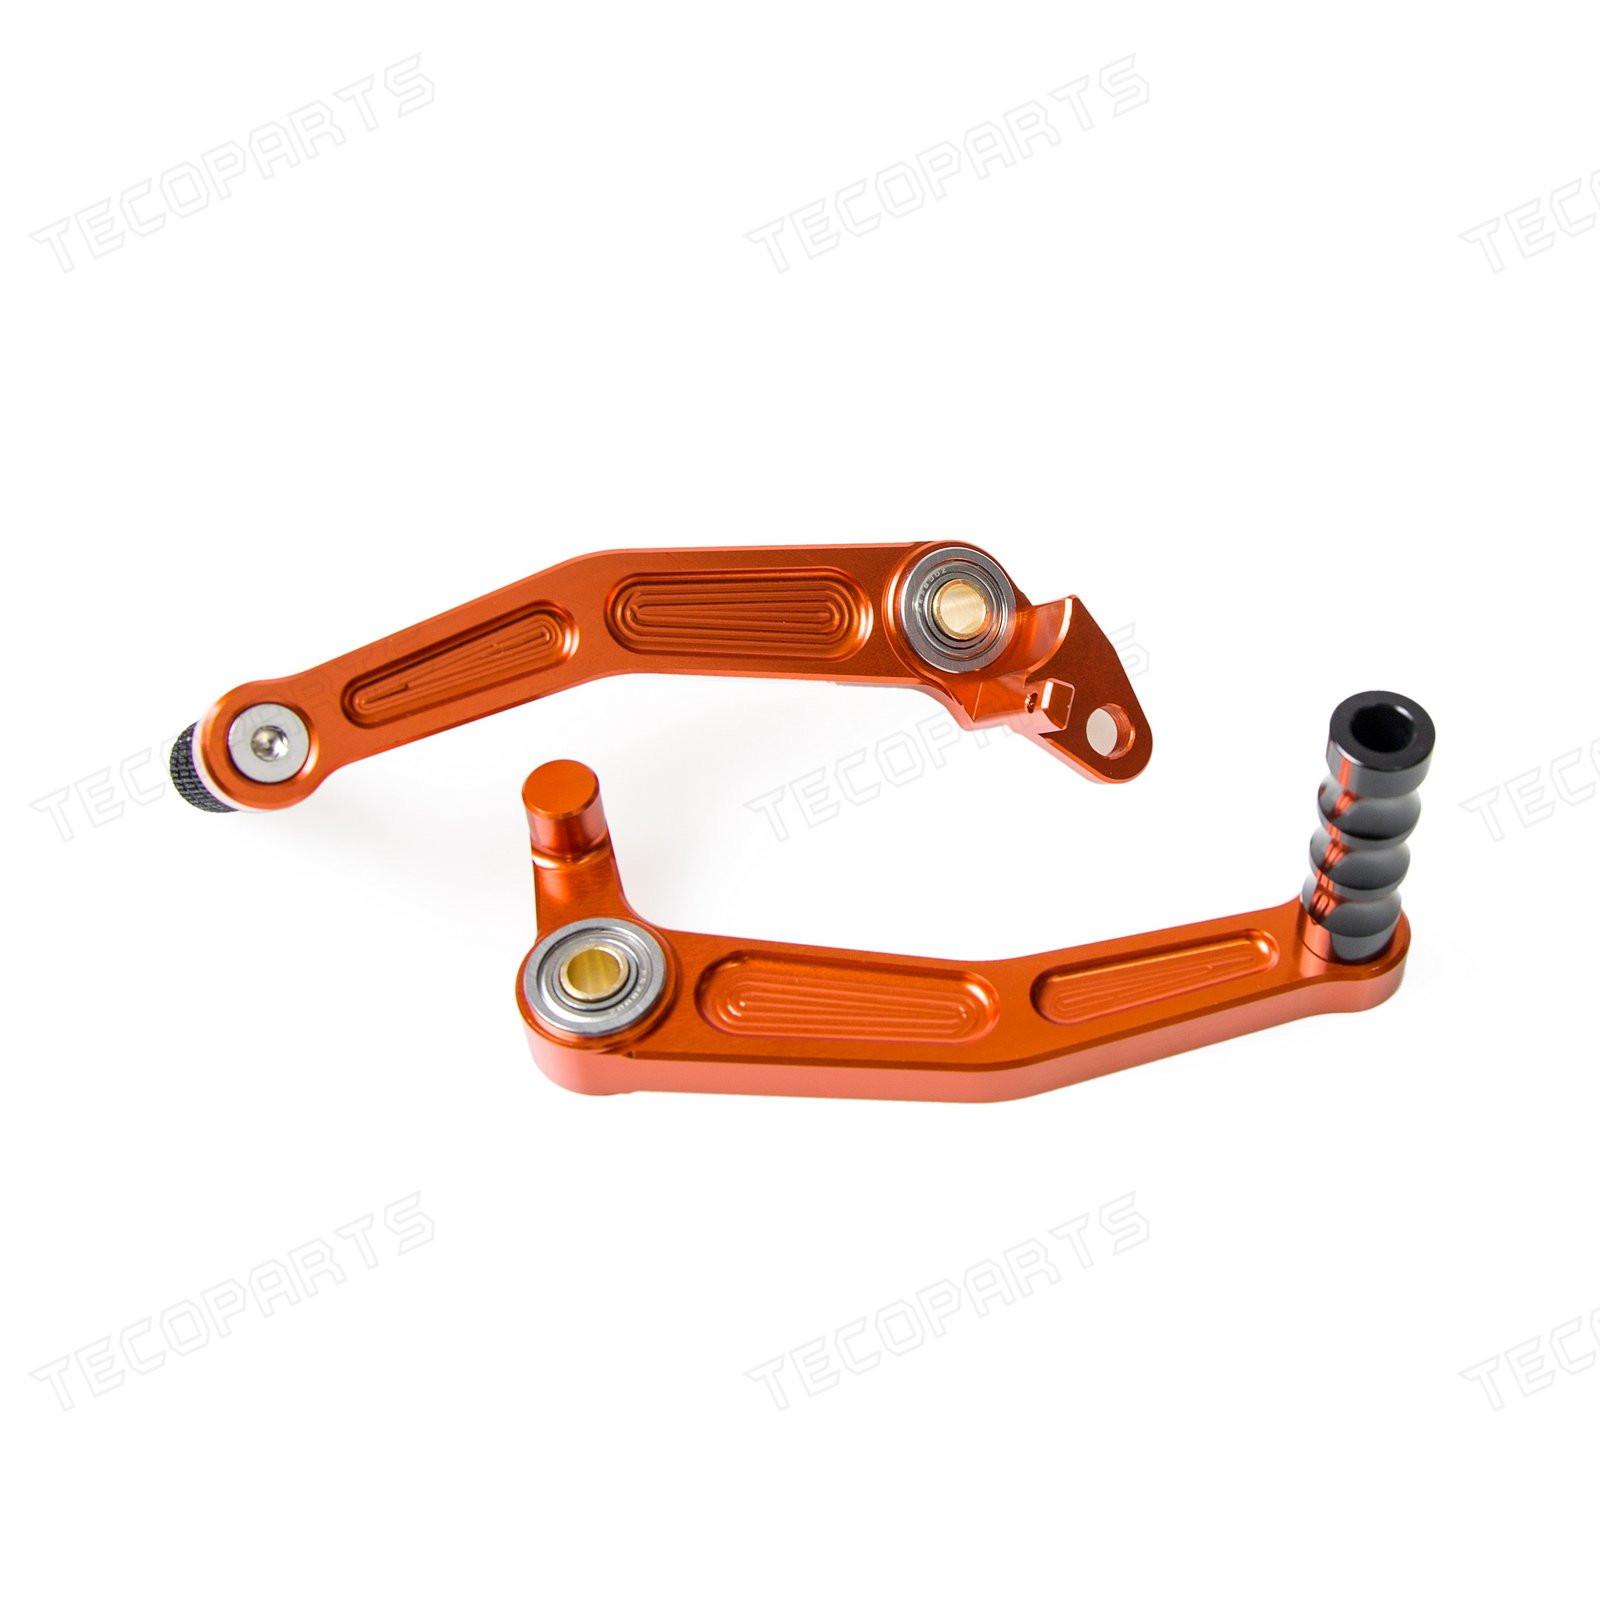 CNC OrangeClutch Gear Pedal Lever for KTM 125 200 390 Duke//RC